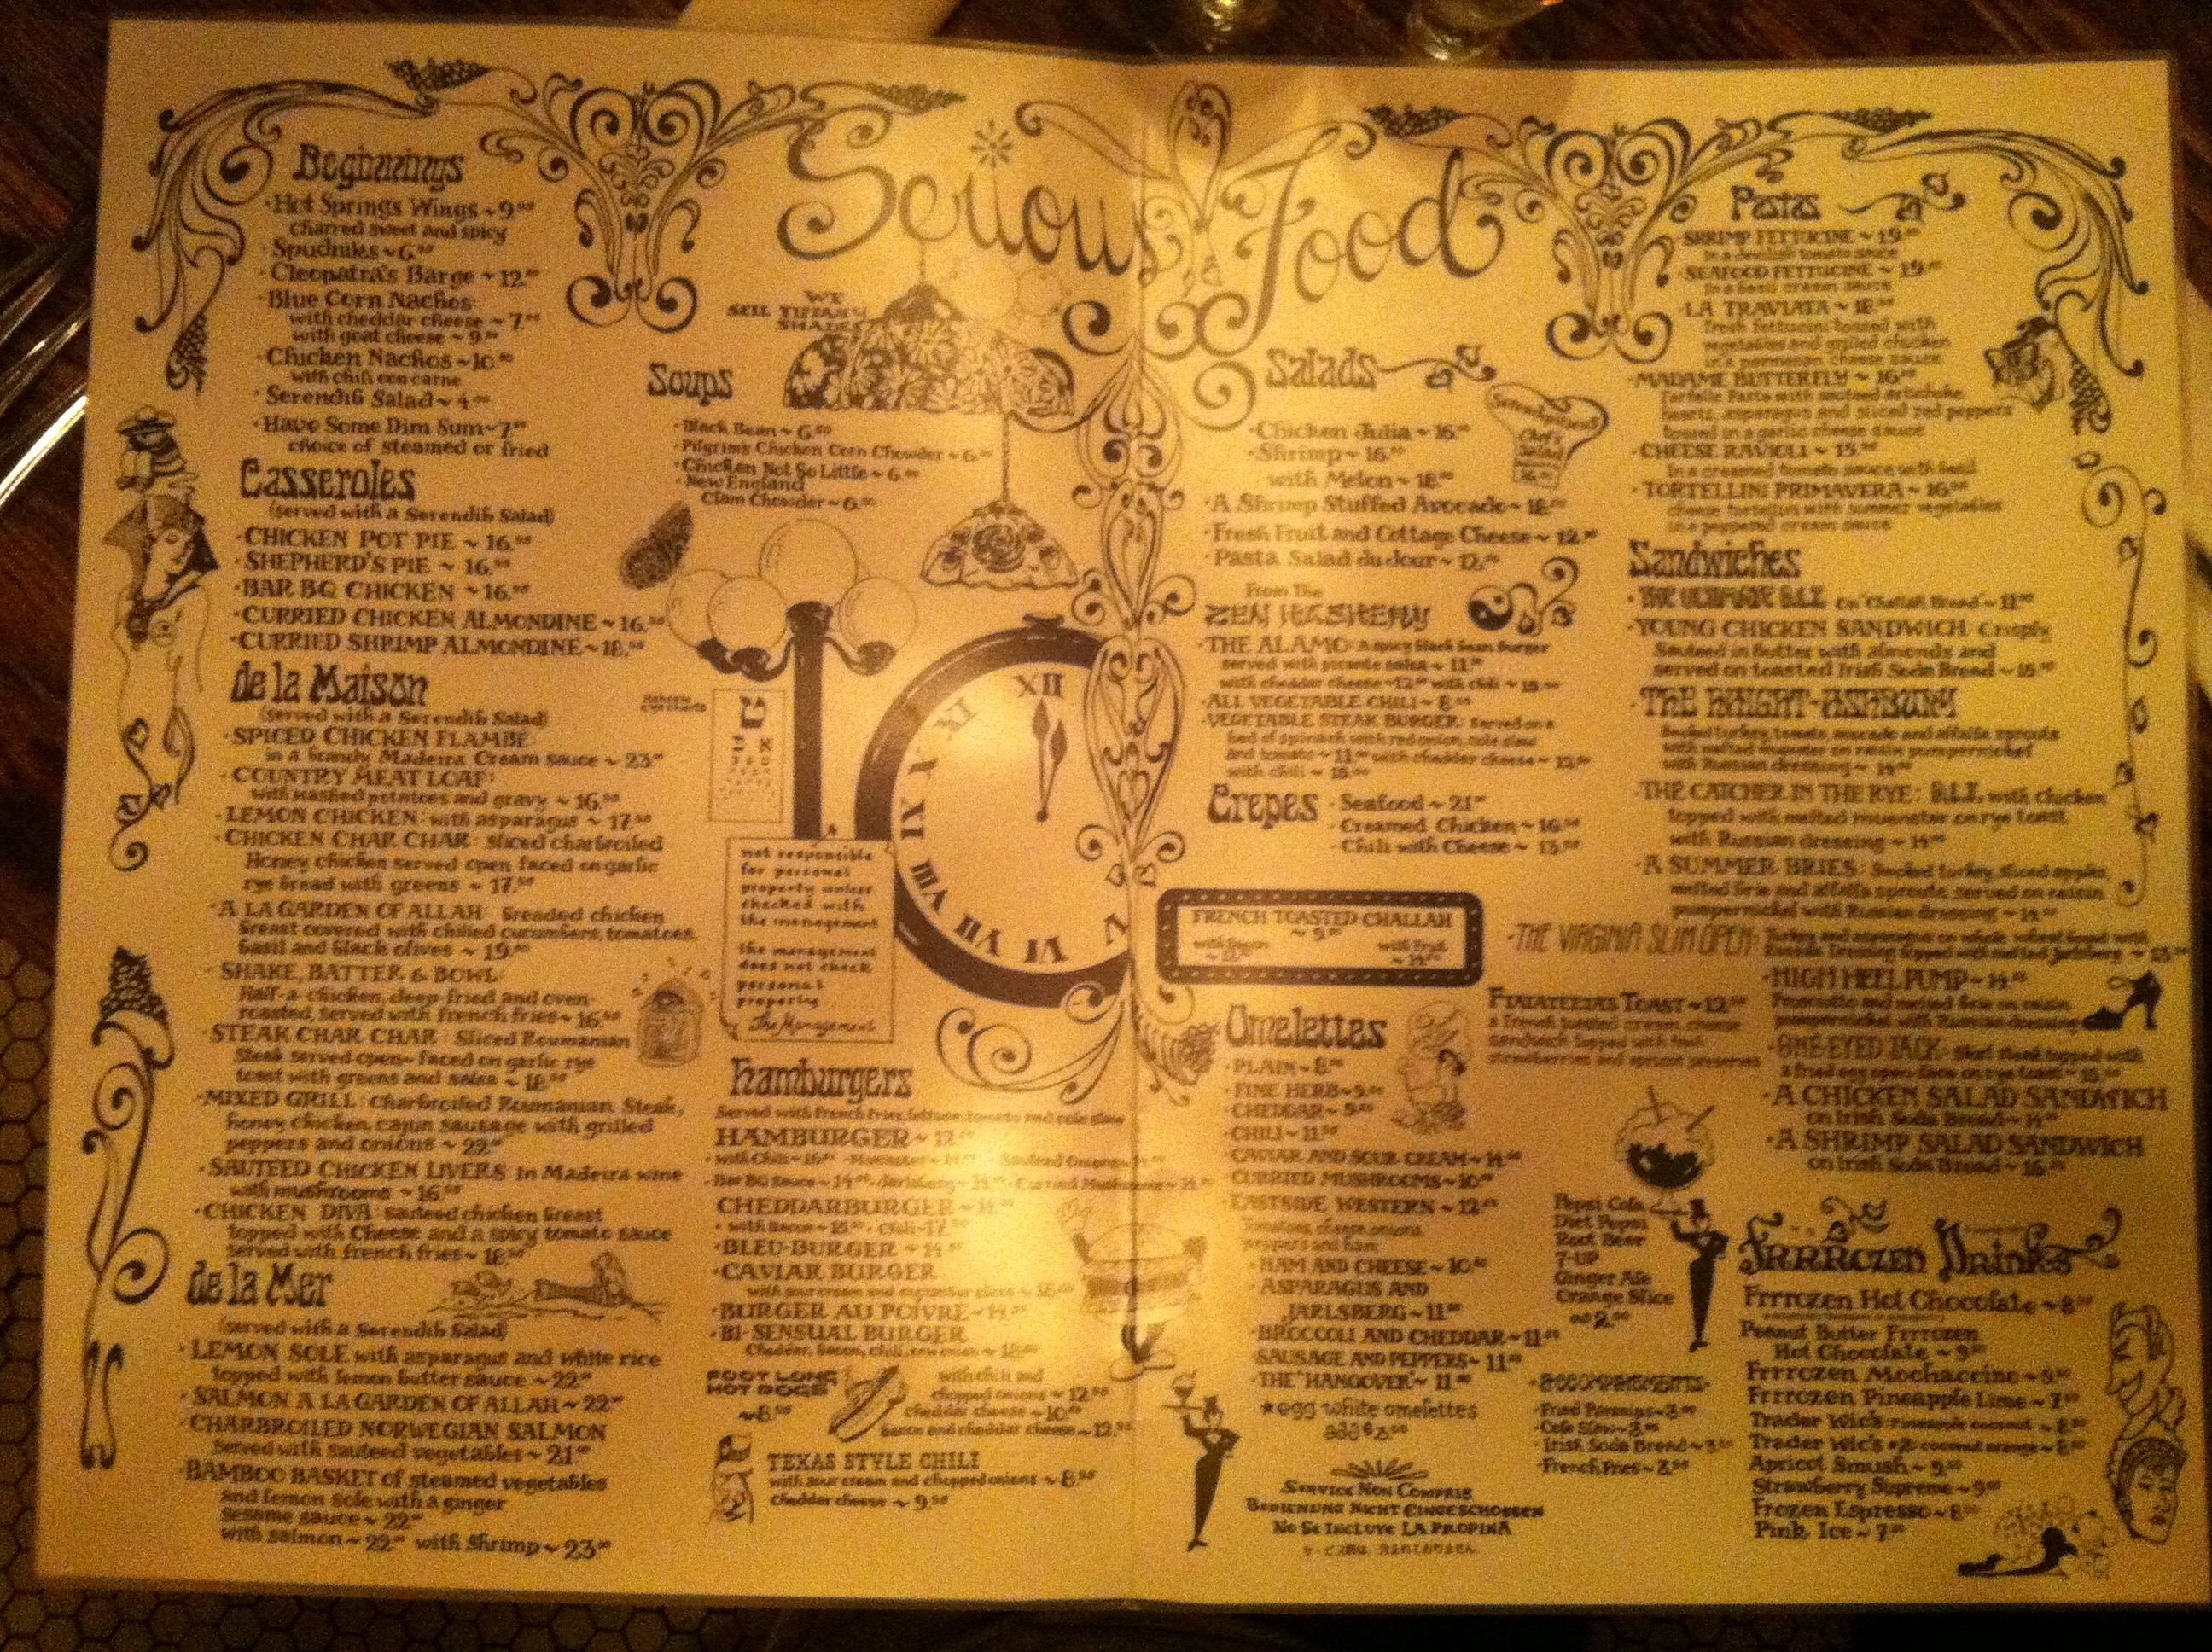 Restaurant review – Serendipity 3 | Tasel's Ramblings